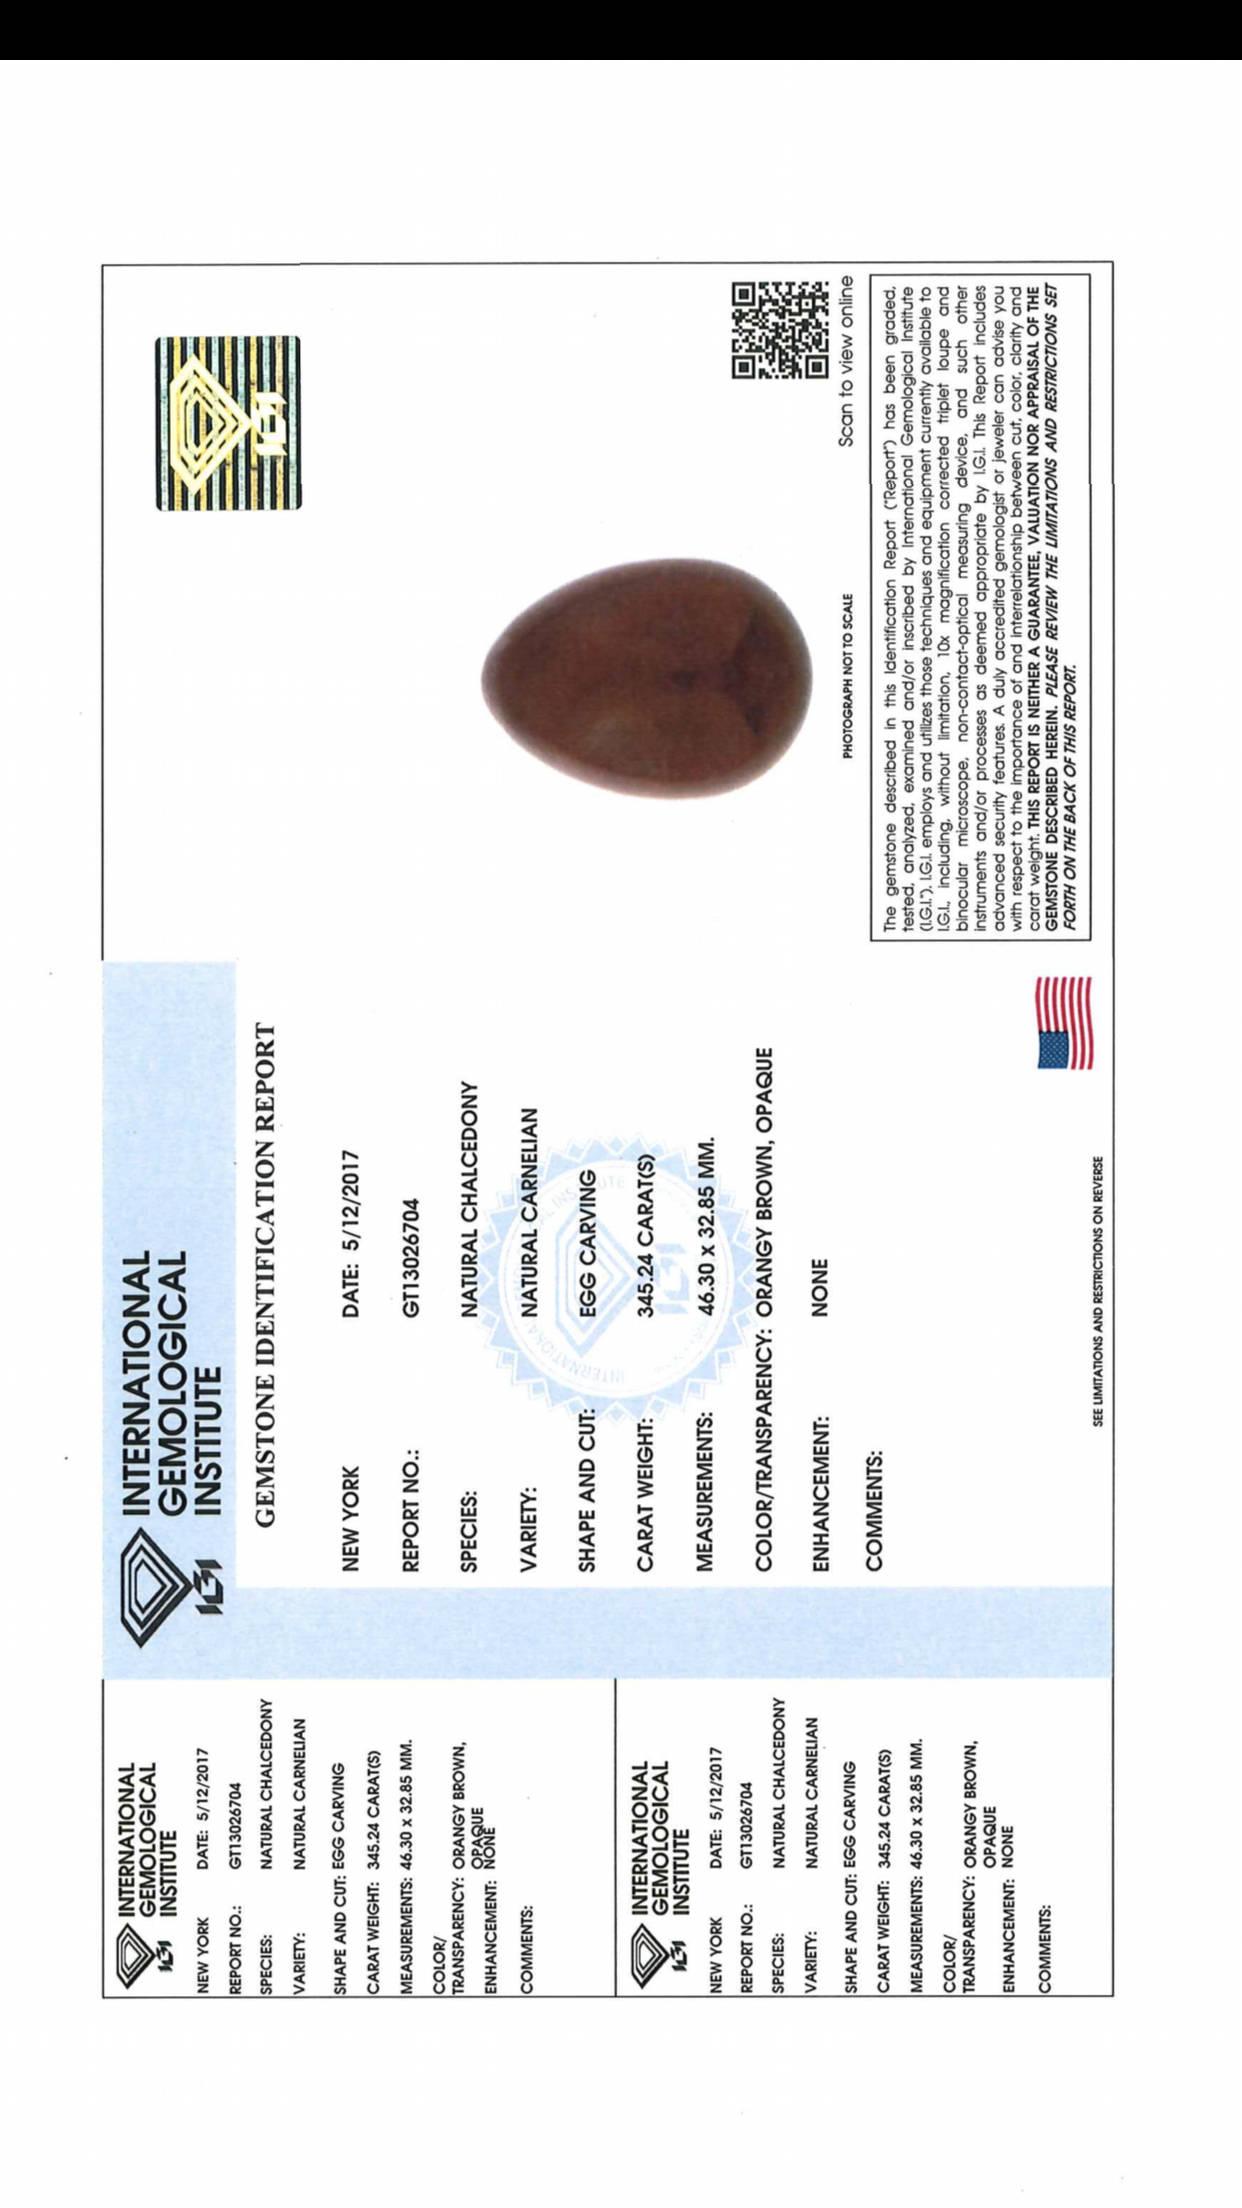 5 Medium Carnelian Yoni Eggs